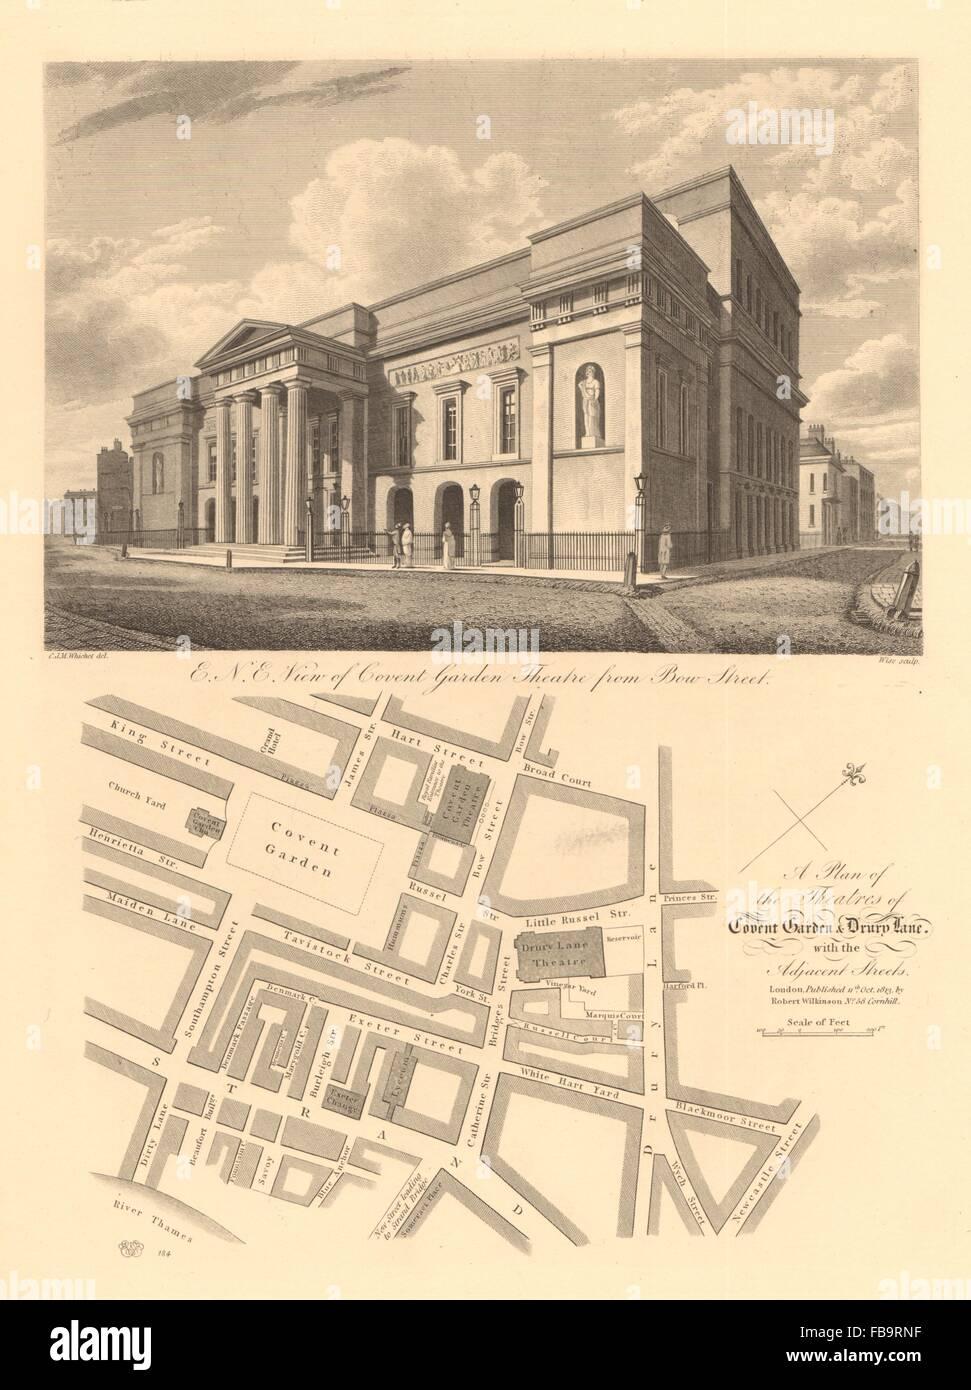 COVENT GARDEN Plan. Theatre Royal/Opera House. Drury lane. Lyceum, 1834 map - Stock Image